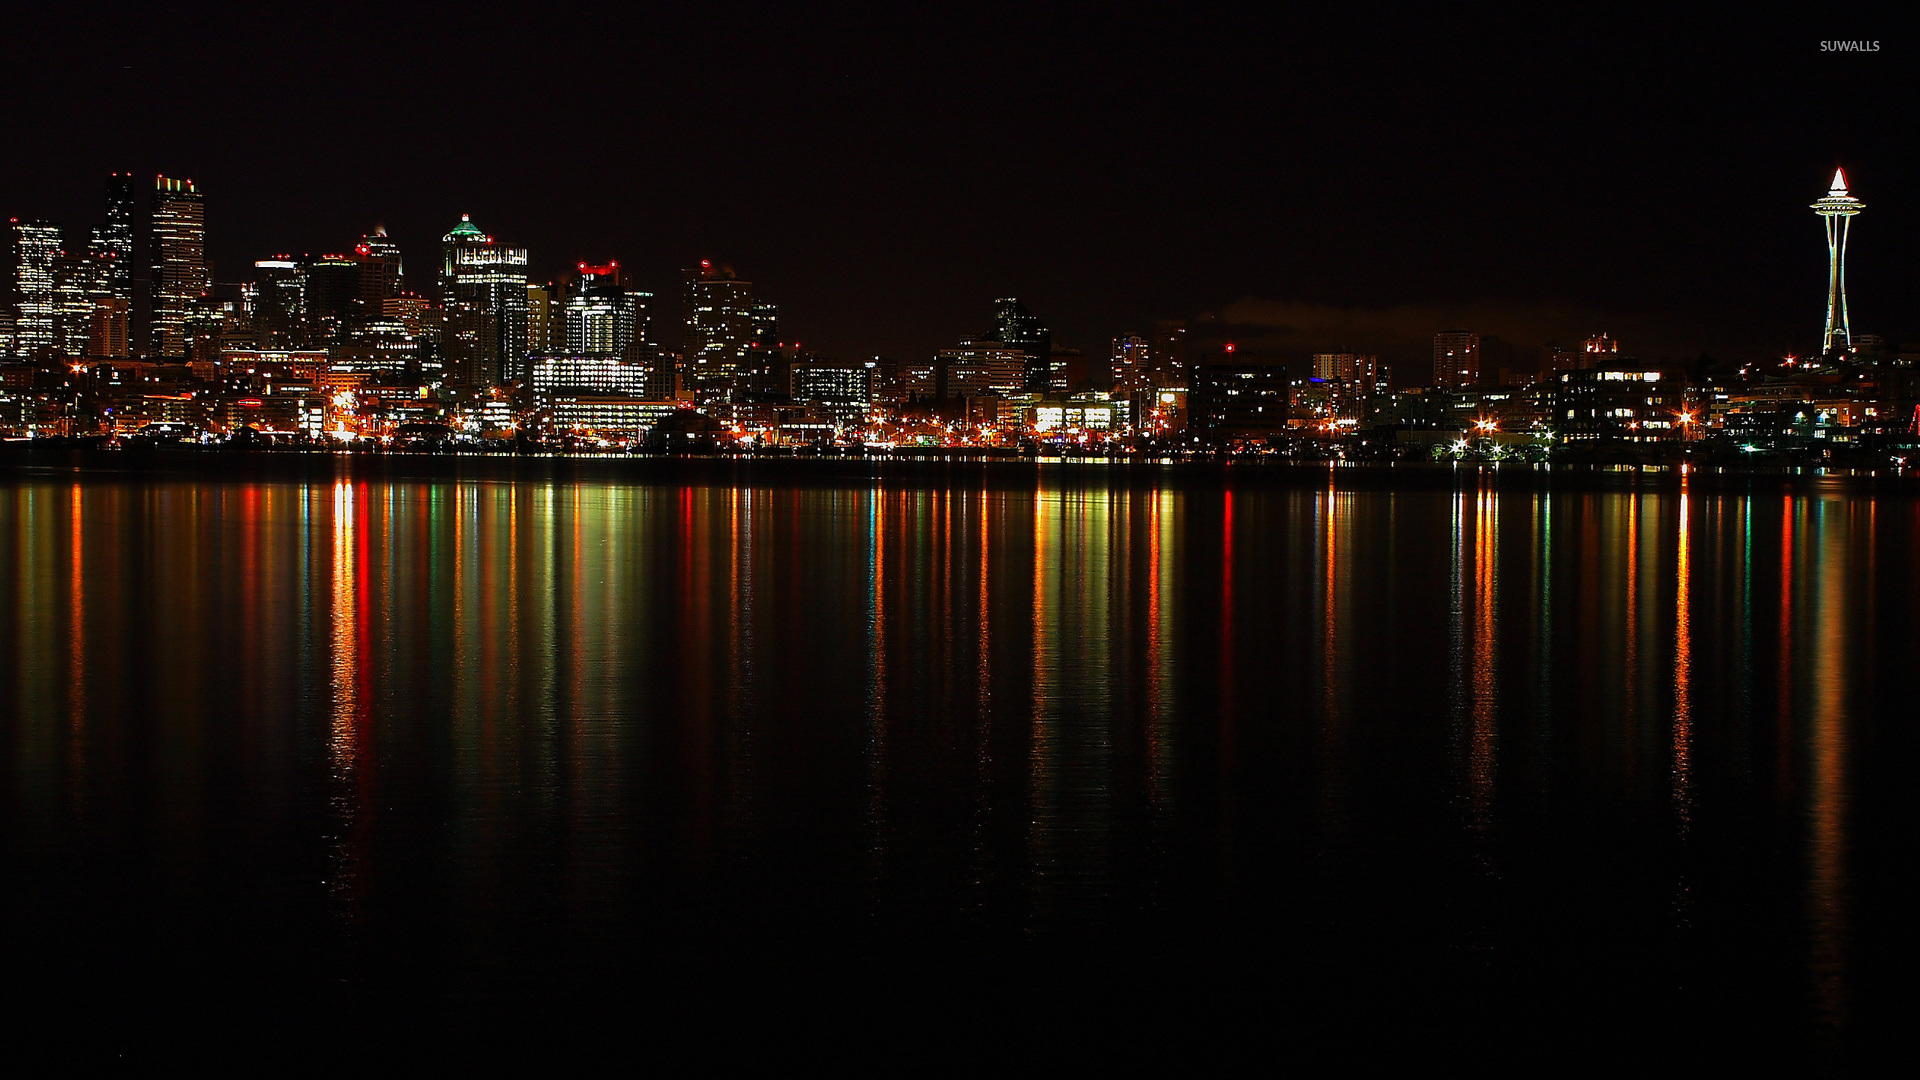 City lights at night wallpaper - World wallpapers - #47014